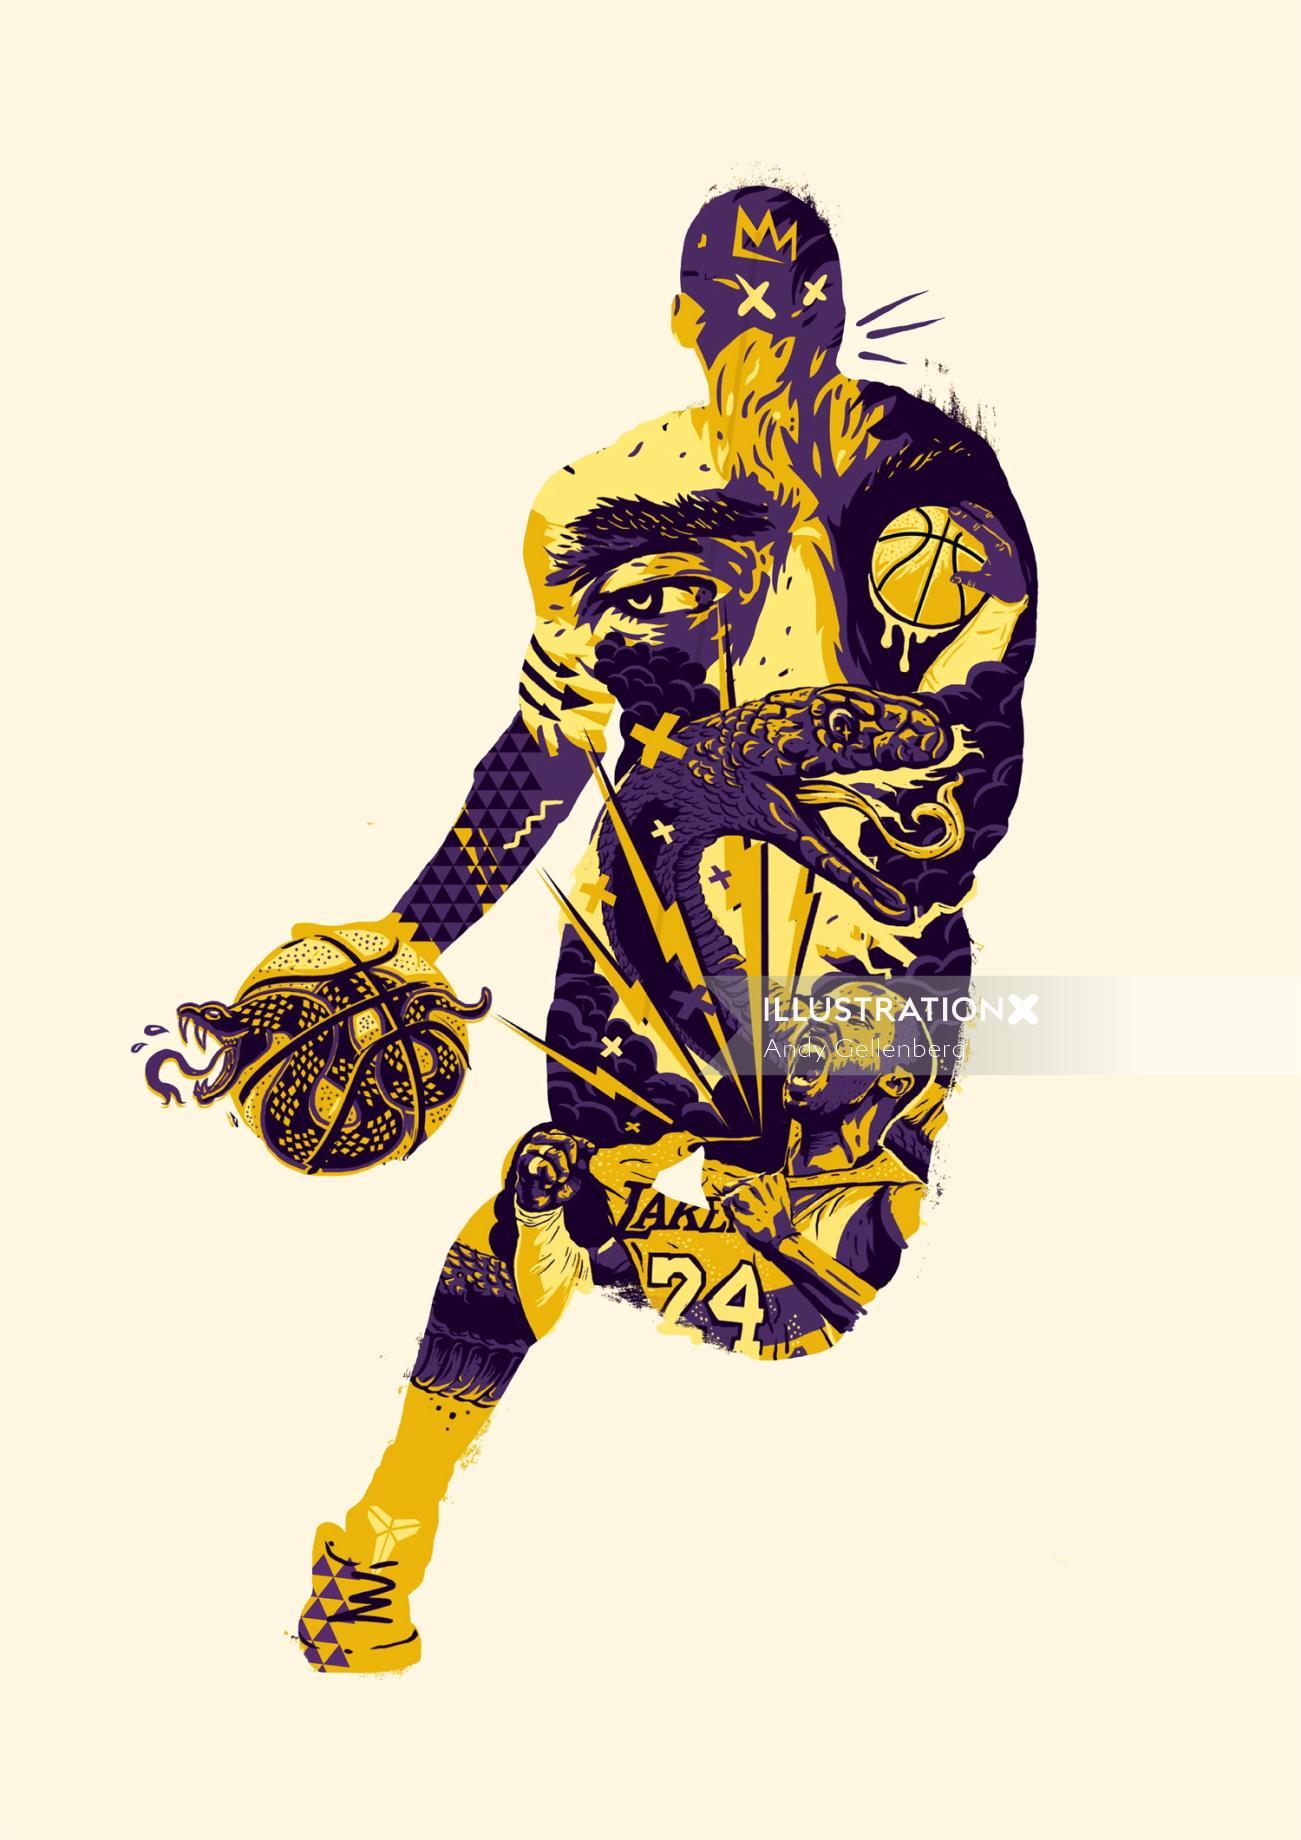 Sport & Fitness basketball player